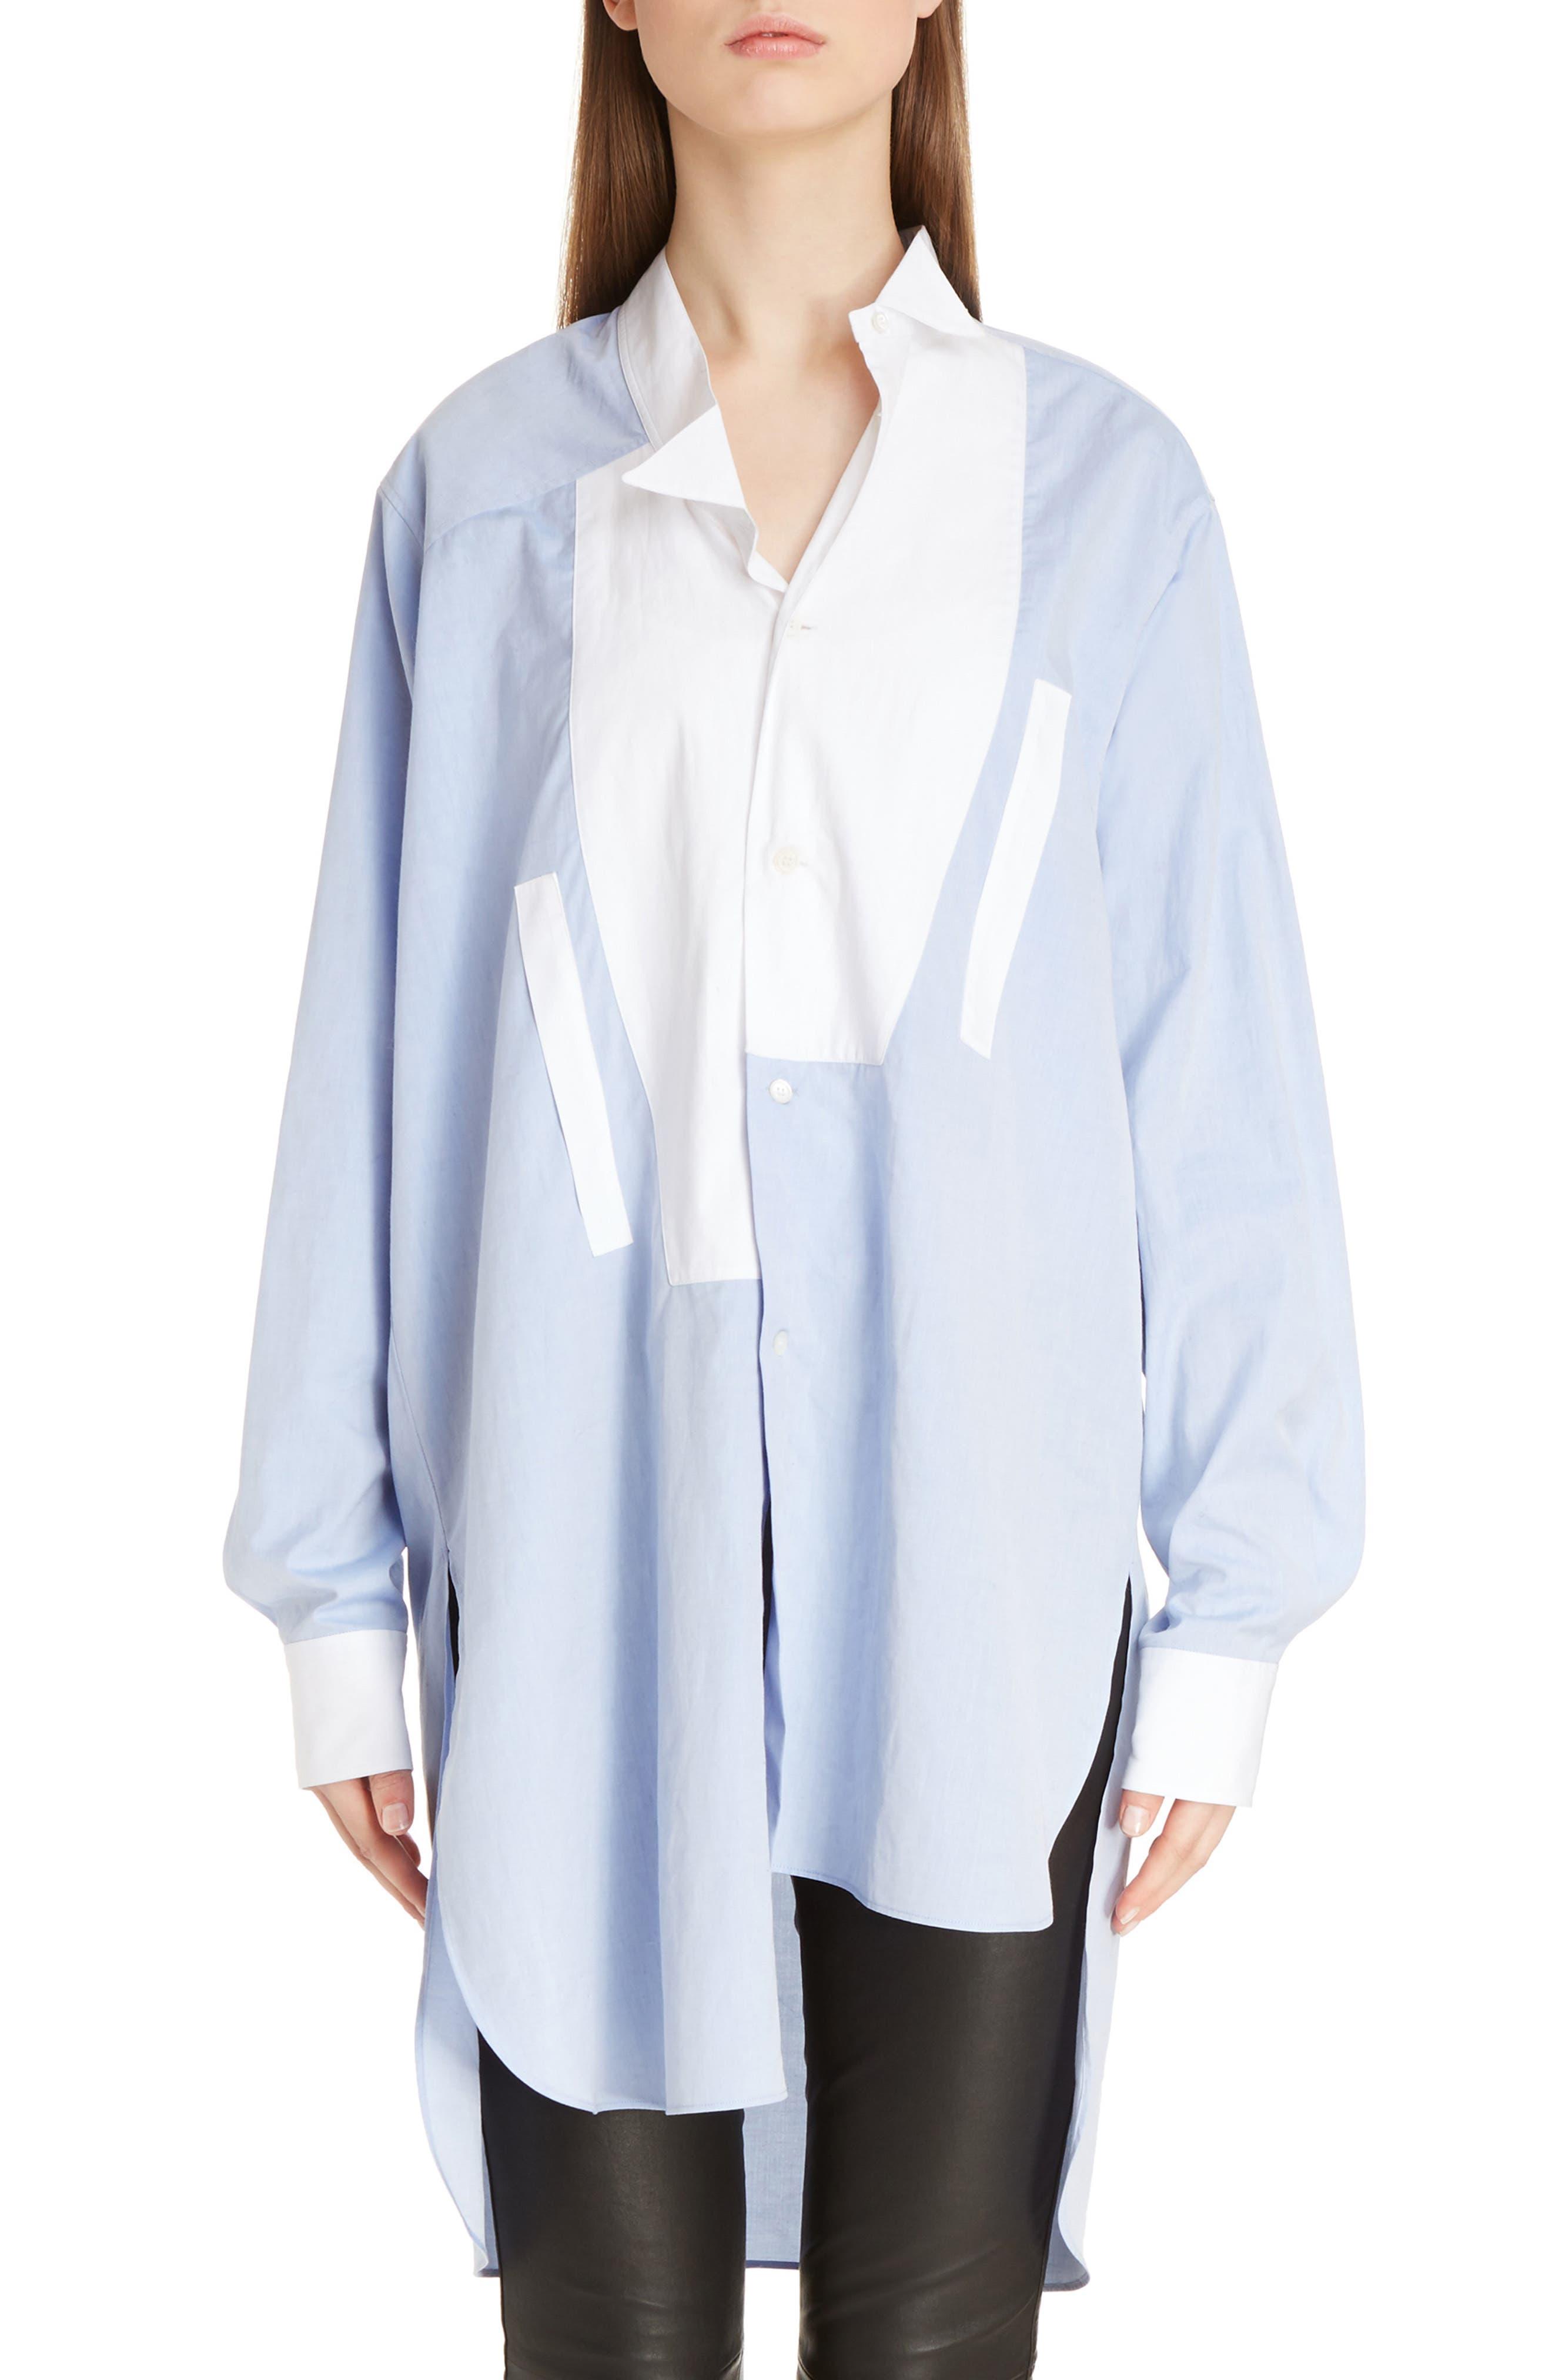 Loewe Asymmetrical Patchwork Cotton Top